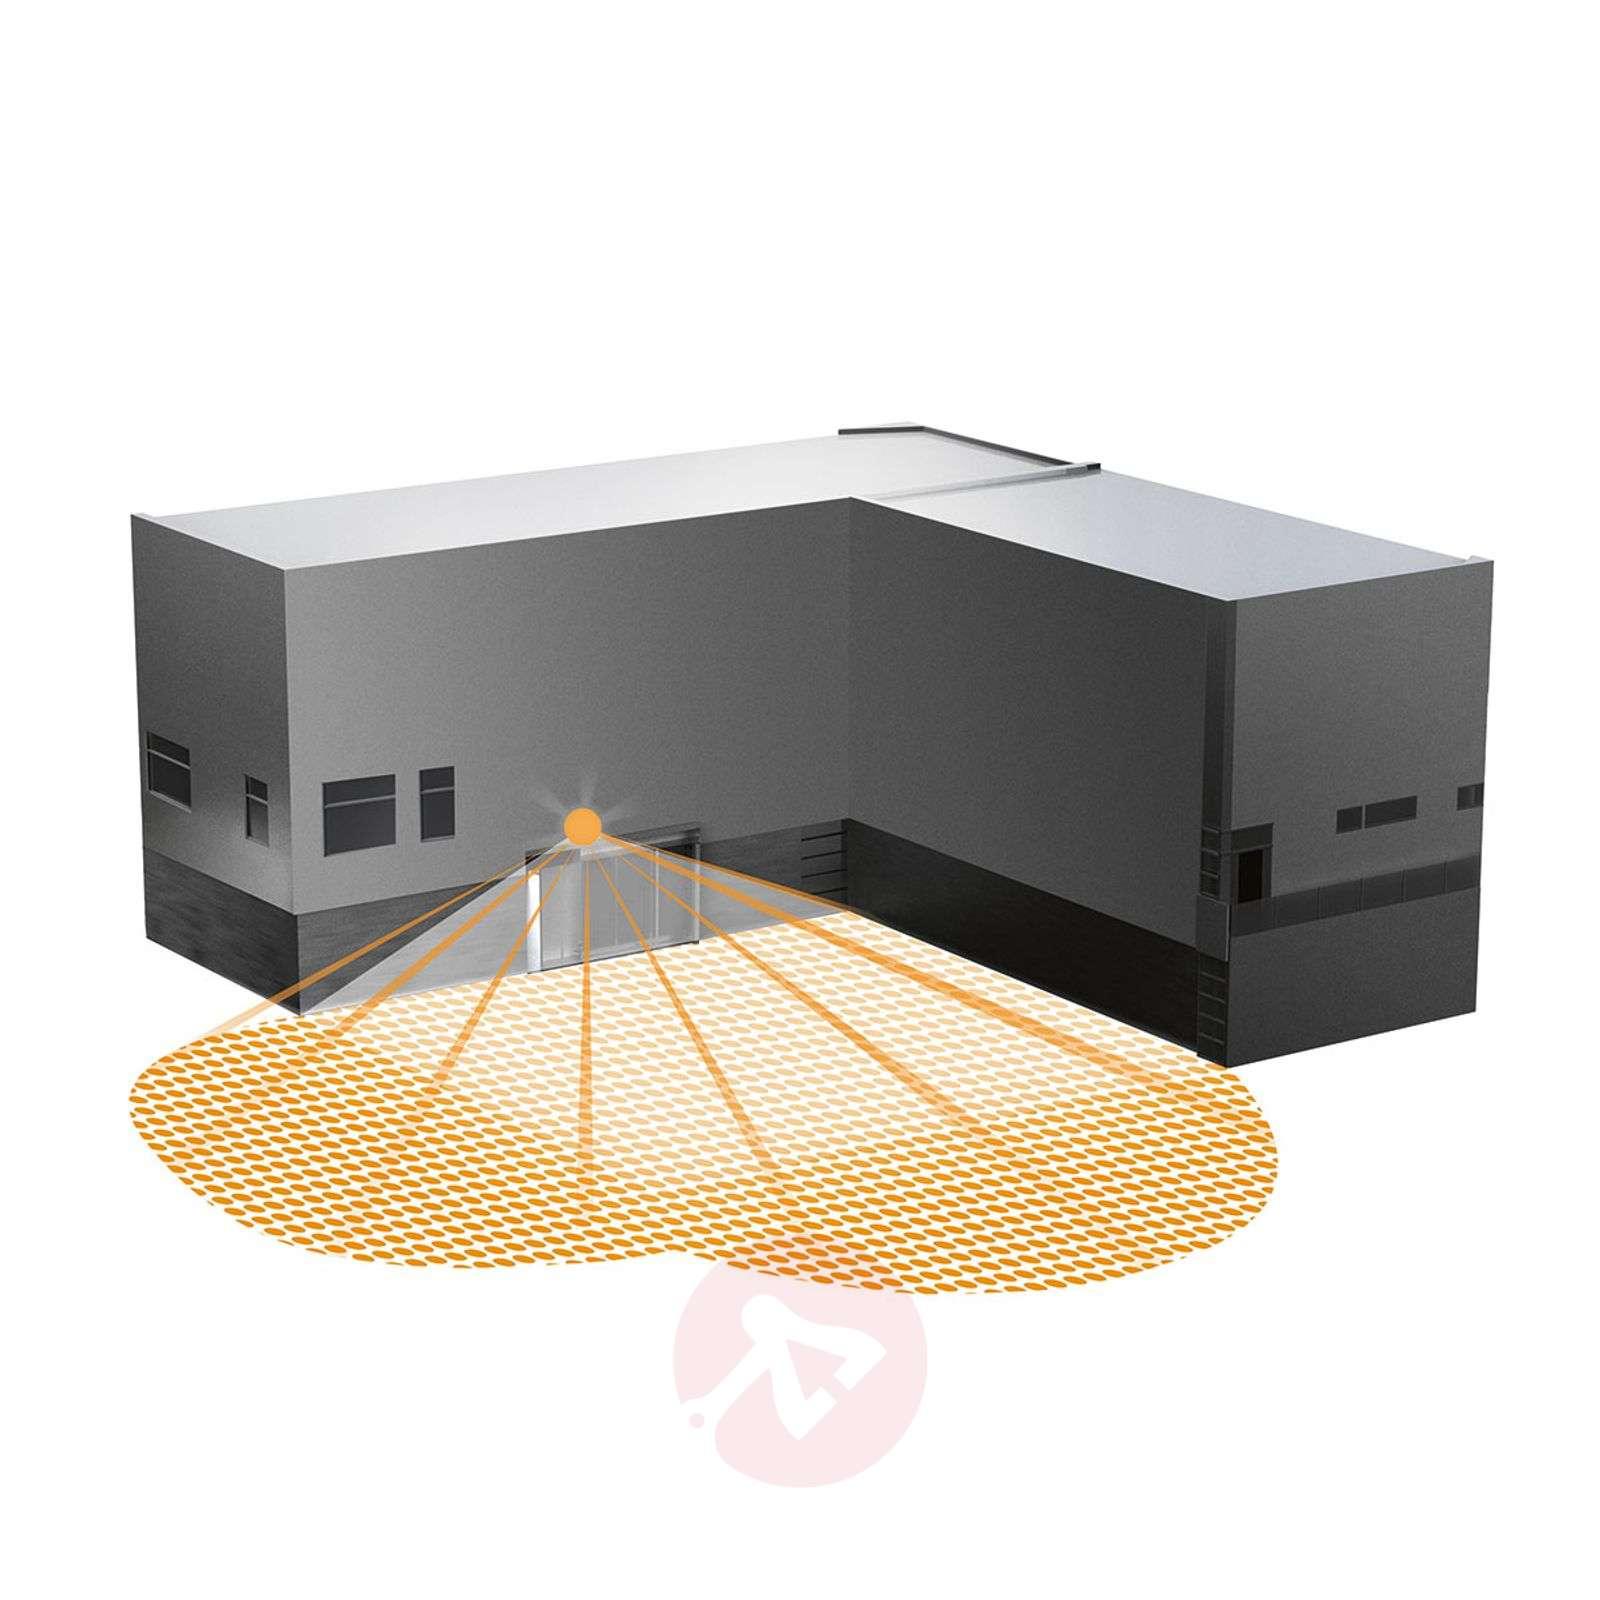 STEINEL XLED Pro Square XL kohdevalaisin ulos-8506073-01